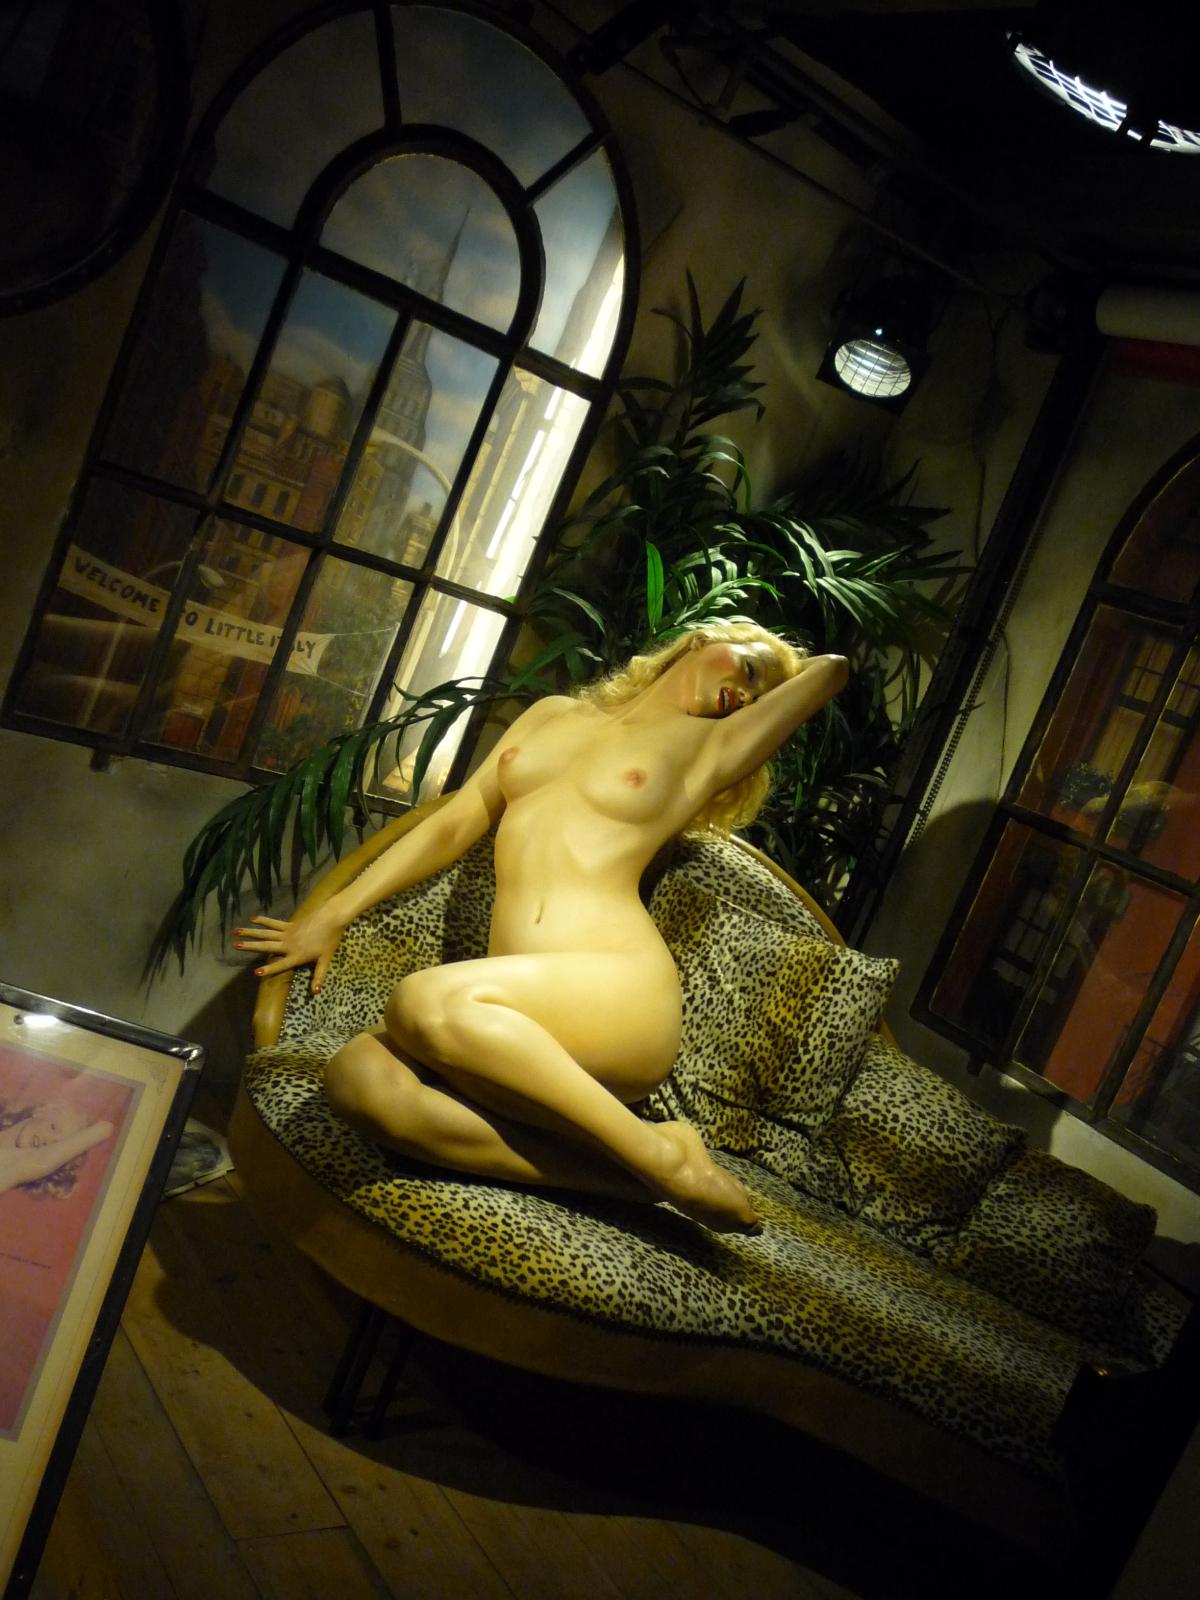 http://yearningforlove.files.wordpress.com/2013/01/p1000337-sex-museum-marilyn-monroe.jpg?w=1200